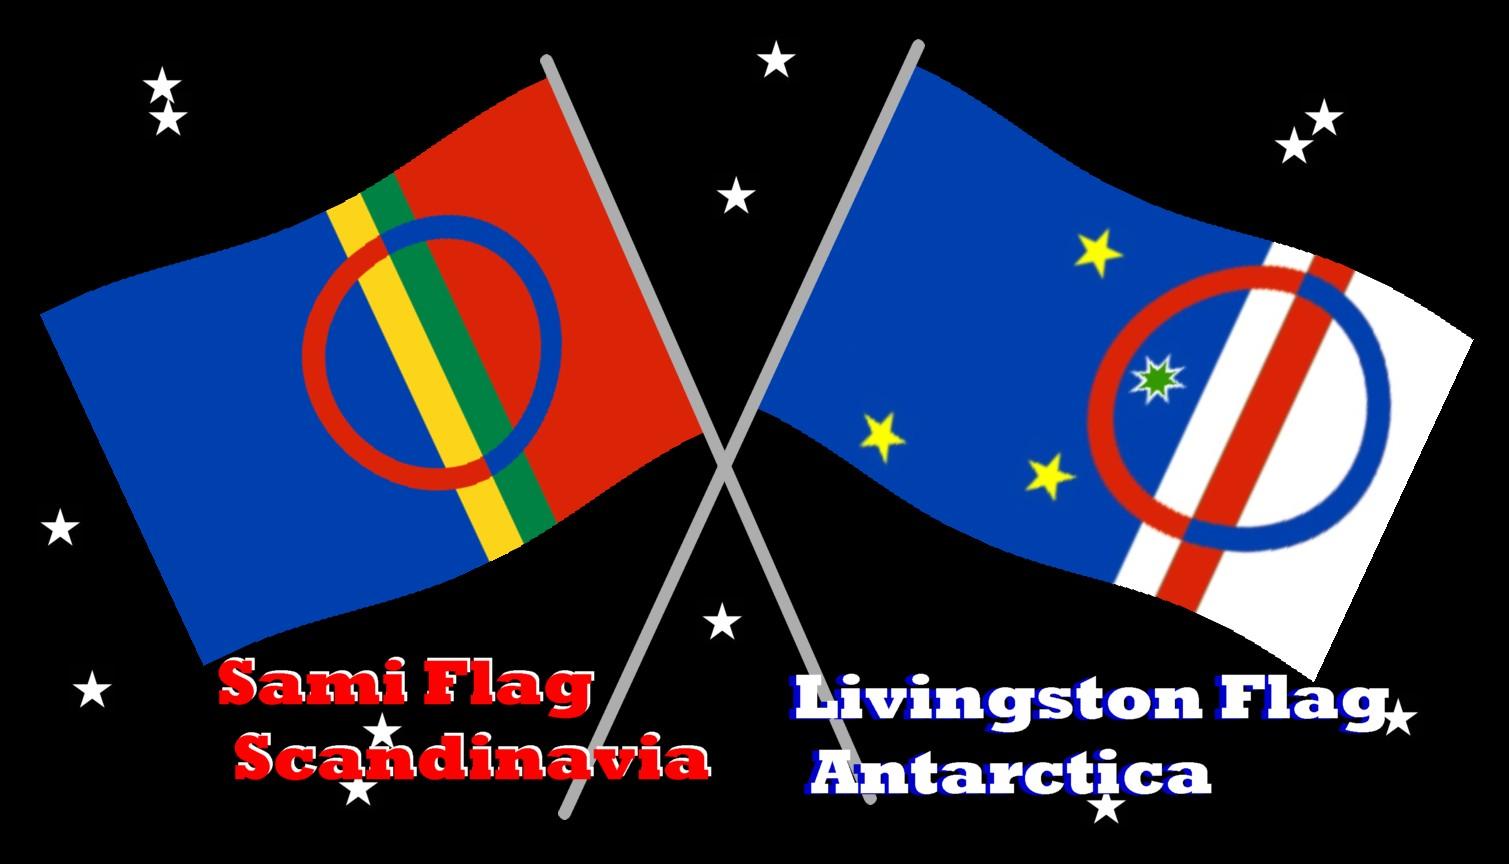 http://4.bp.blogspot.com/-_U44VViCeuU/TzaPLPAnr-I/AAAAAAAAGY4/R384YsVVPUM/s1600/Livingston%252BFlag%252BAntarctica%252Bwith%252BSami%252BFlag%252BScandinavia%252Bcompared.jpg